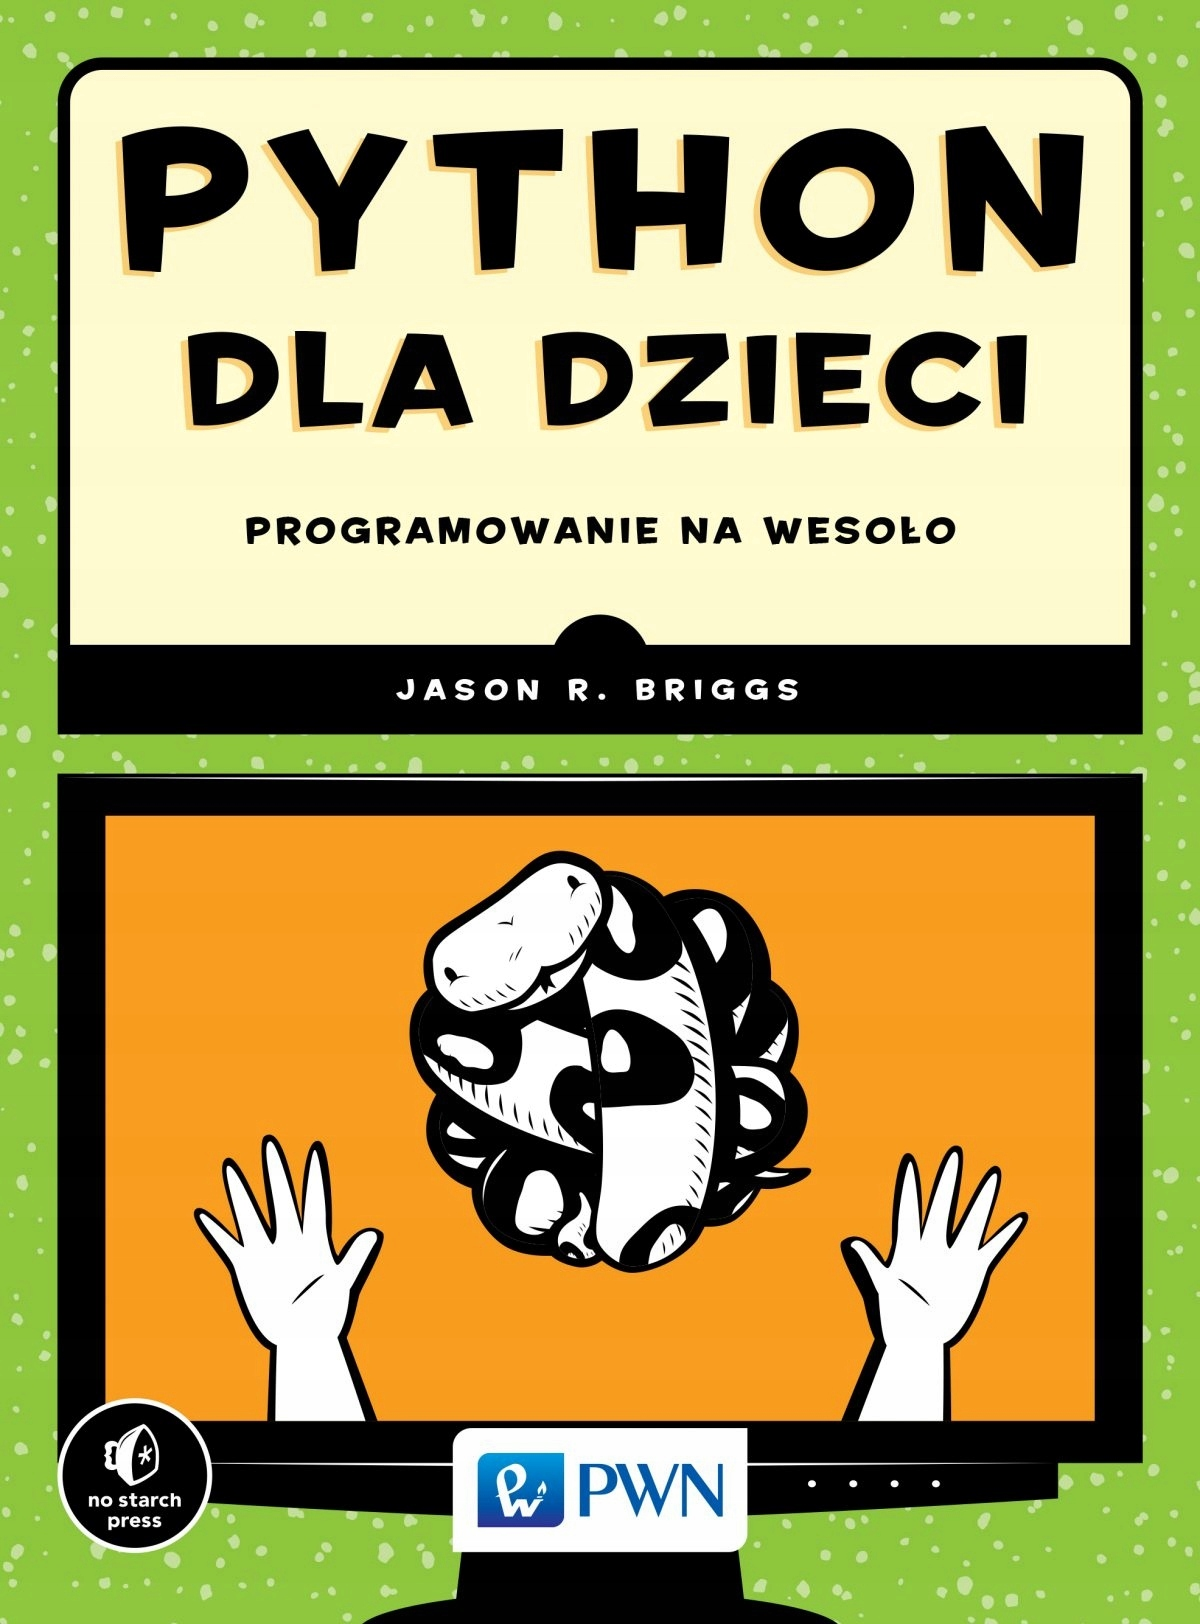 Python dla dzieci. Jason R. Briggs